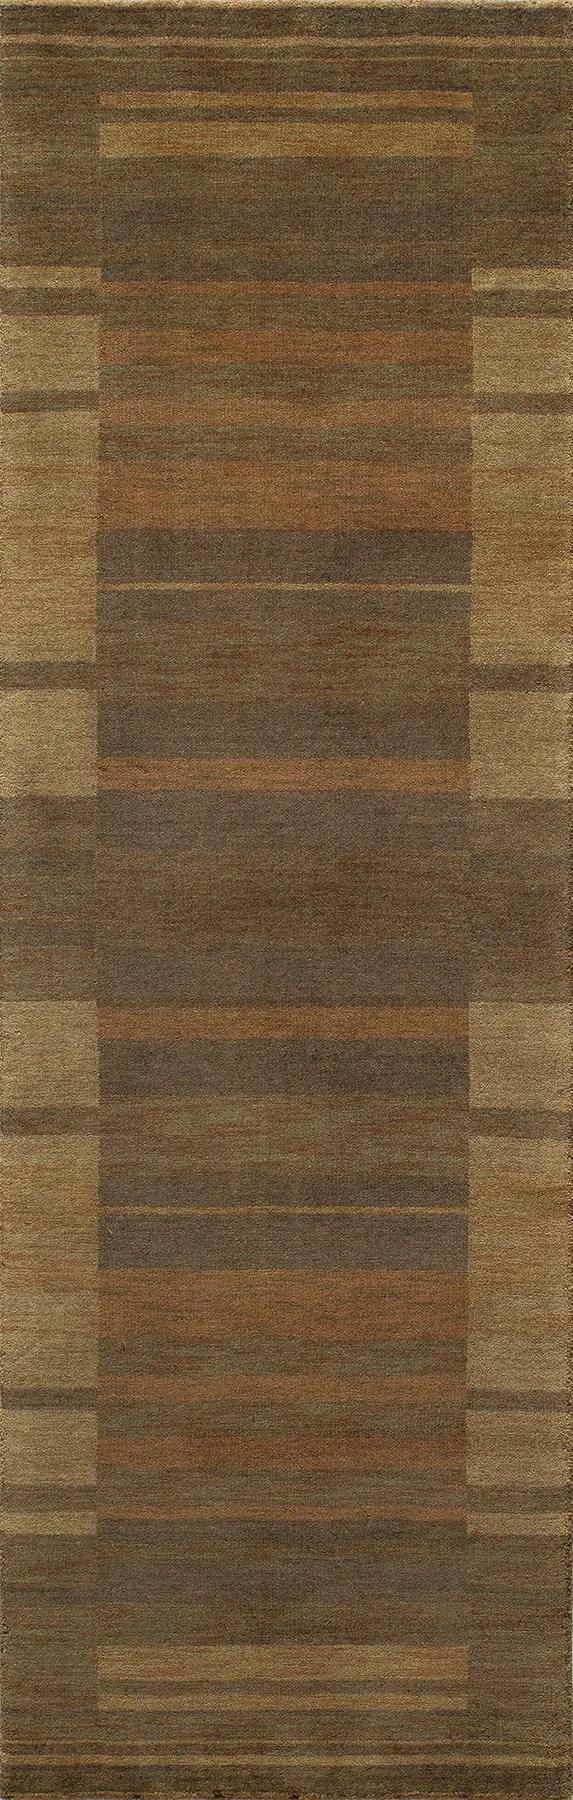 Donaghy Hand-Woven Brown/Yellow Area Rug Rug Size: Rectangle 8' x 11'